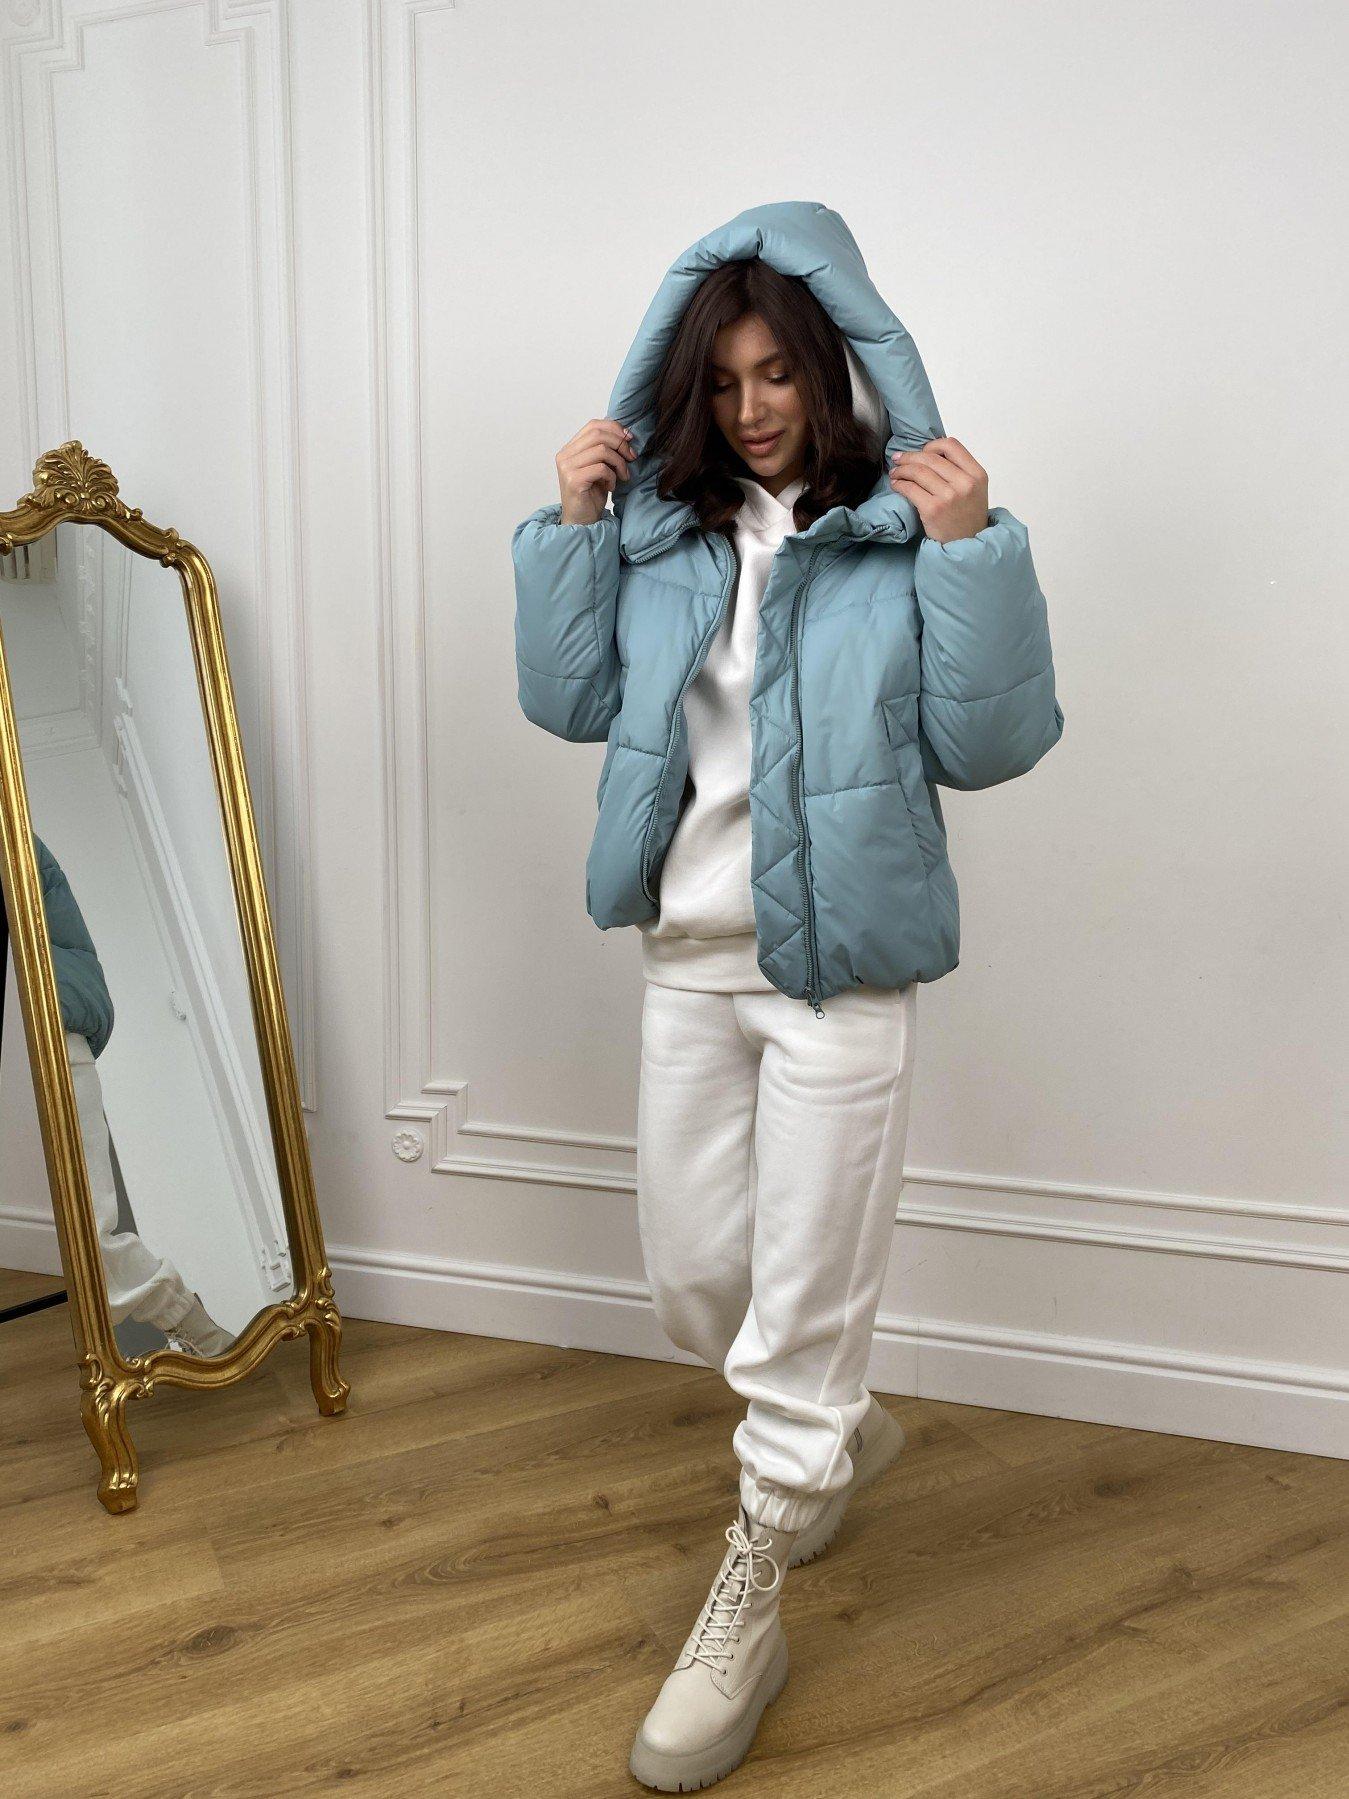 Нокс куртка  из плащевой ткани Astra 10994 АРТ. 47484 Цвет: Олива Astra - фото 3, интернет магазин tm-modus.ru